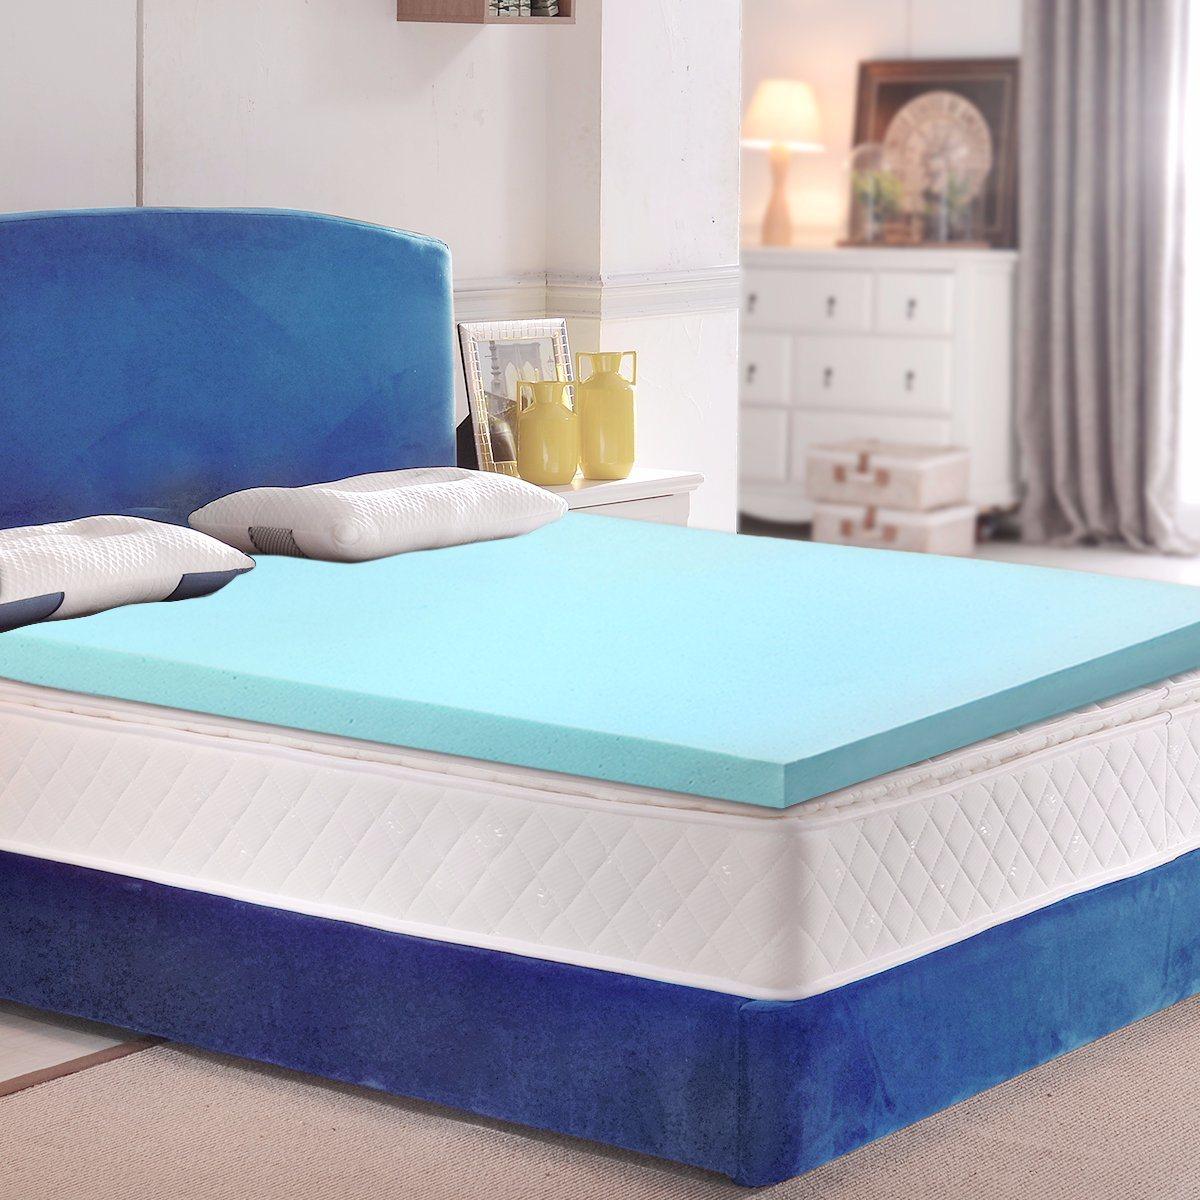 China Sleepwell Cool Gel Memory Foam Mattress Topper Home Leisure